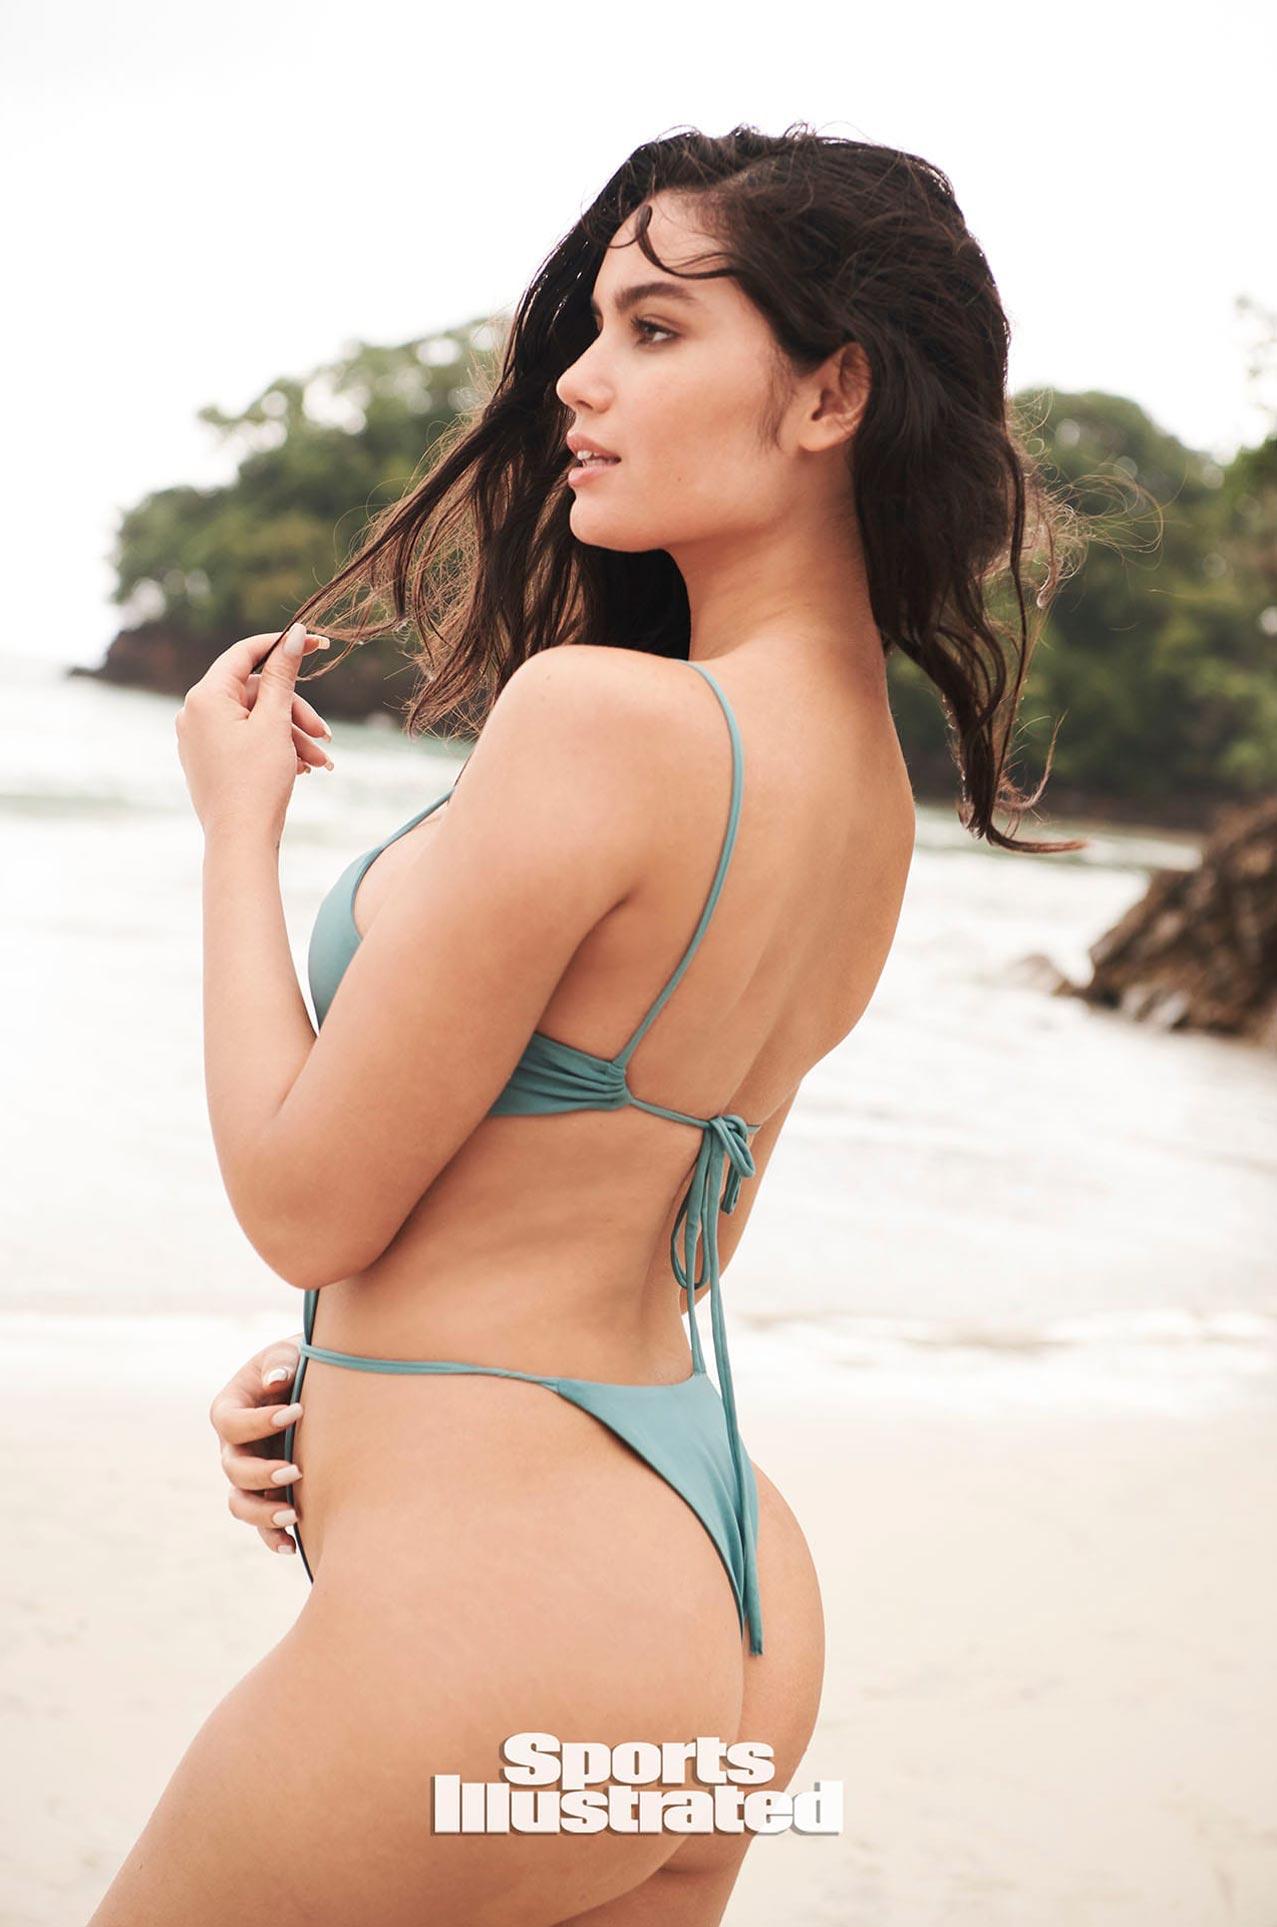 Энн де Паула в каталоге купальников Sports Illustrated Swimsuit 2020 / фото 27